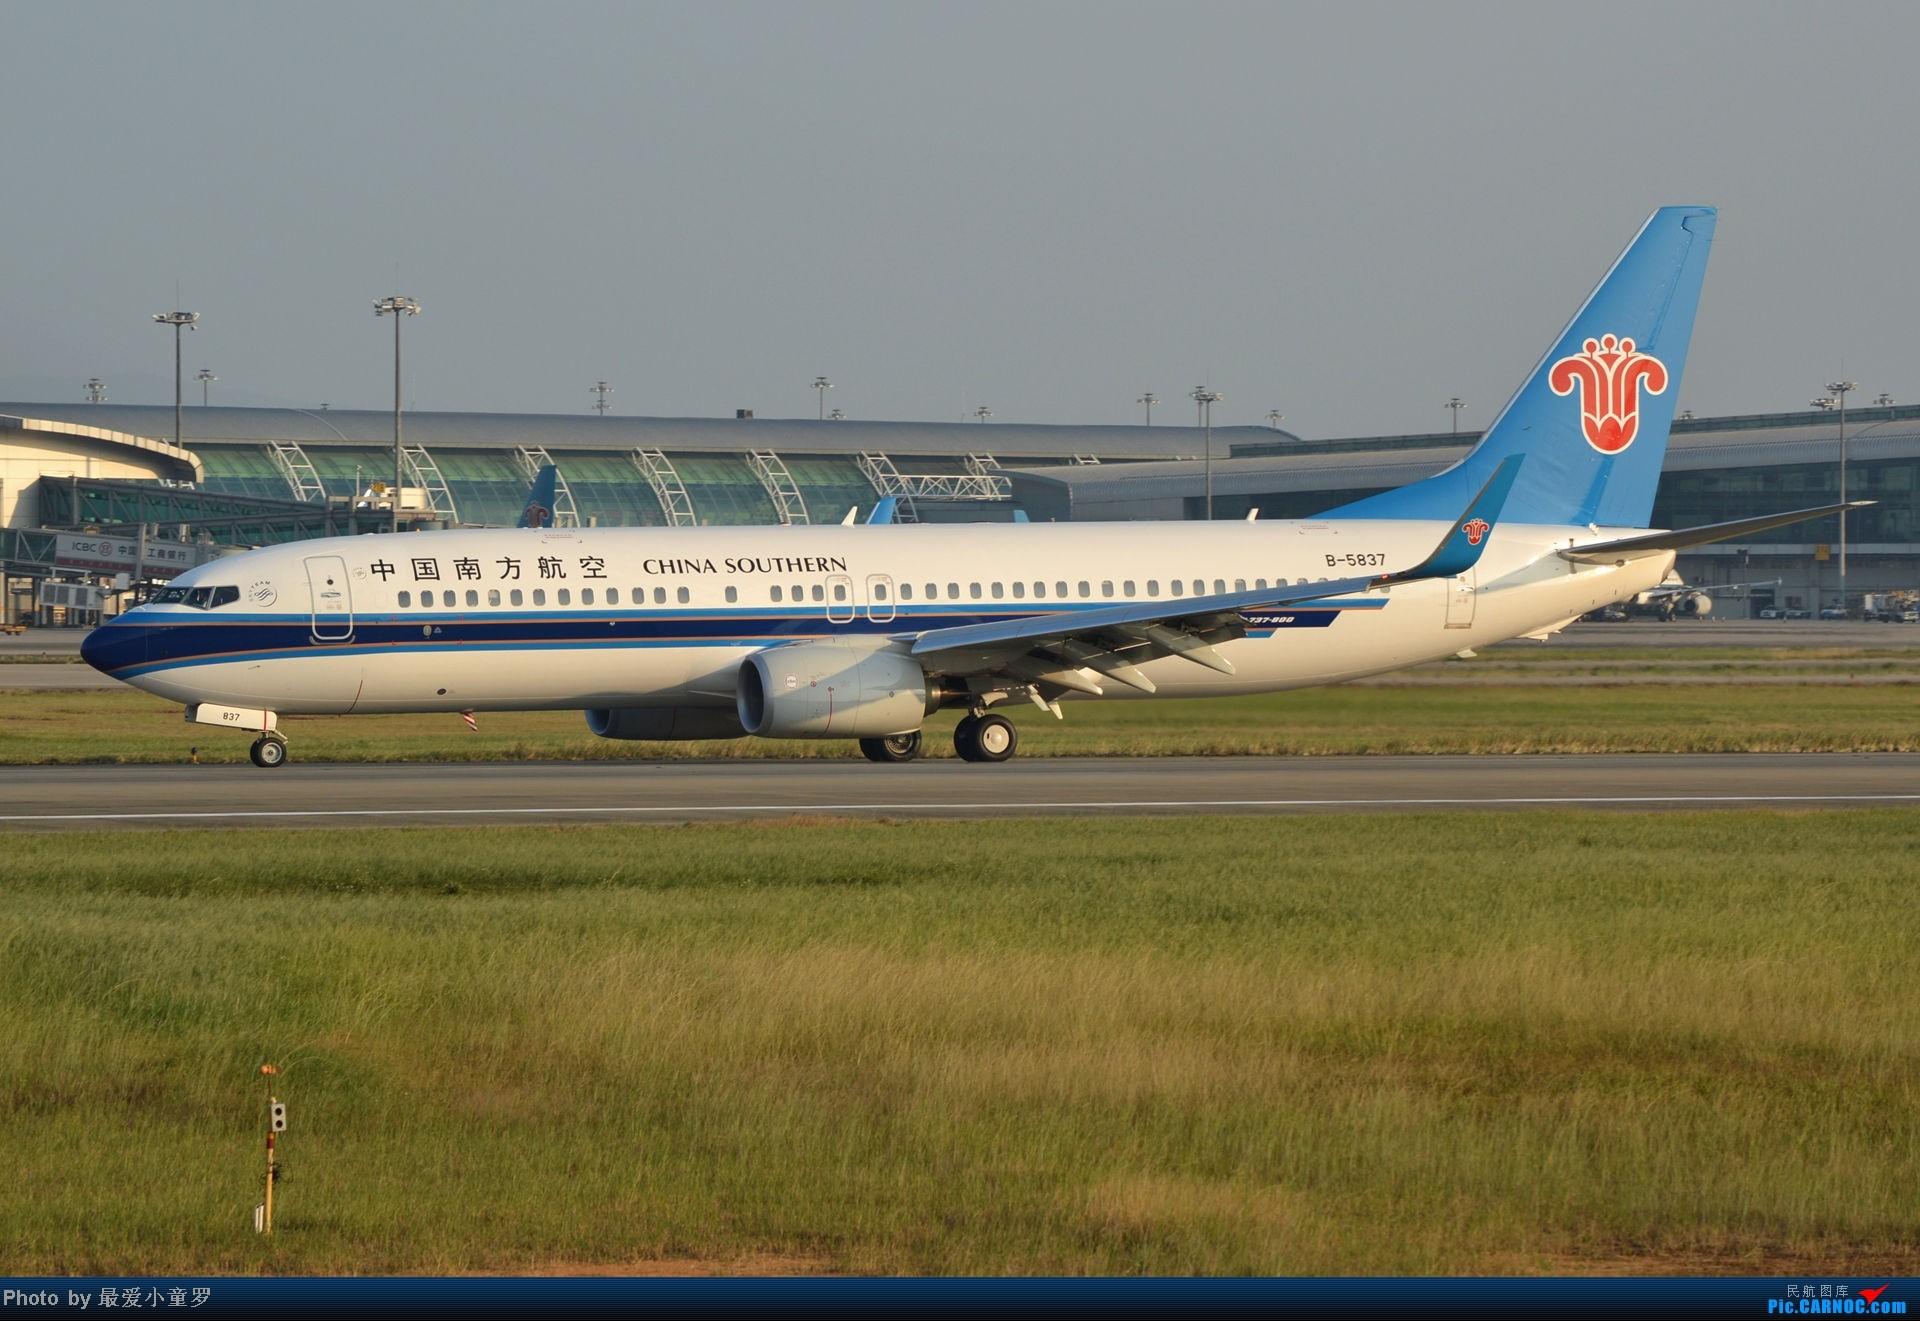 Re:[原创]老图系列,13年11月15日广州白云机场西跑拍机 BOEING 737-800 B-5837 中国广州白云机场